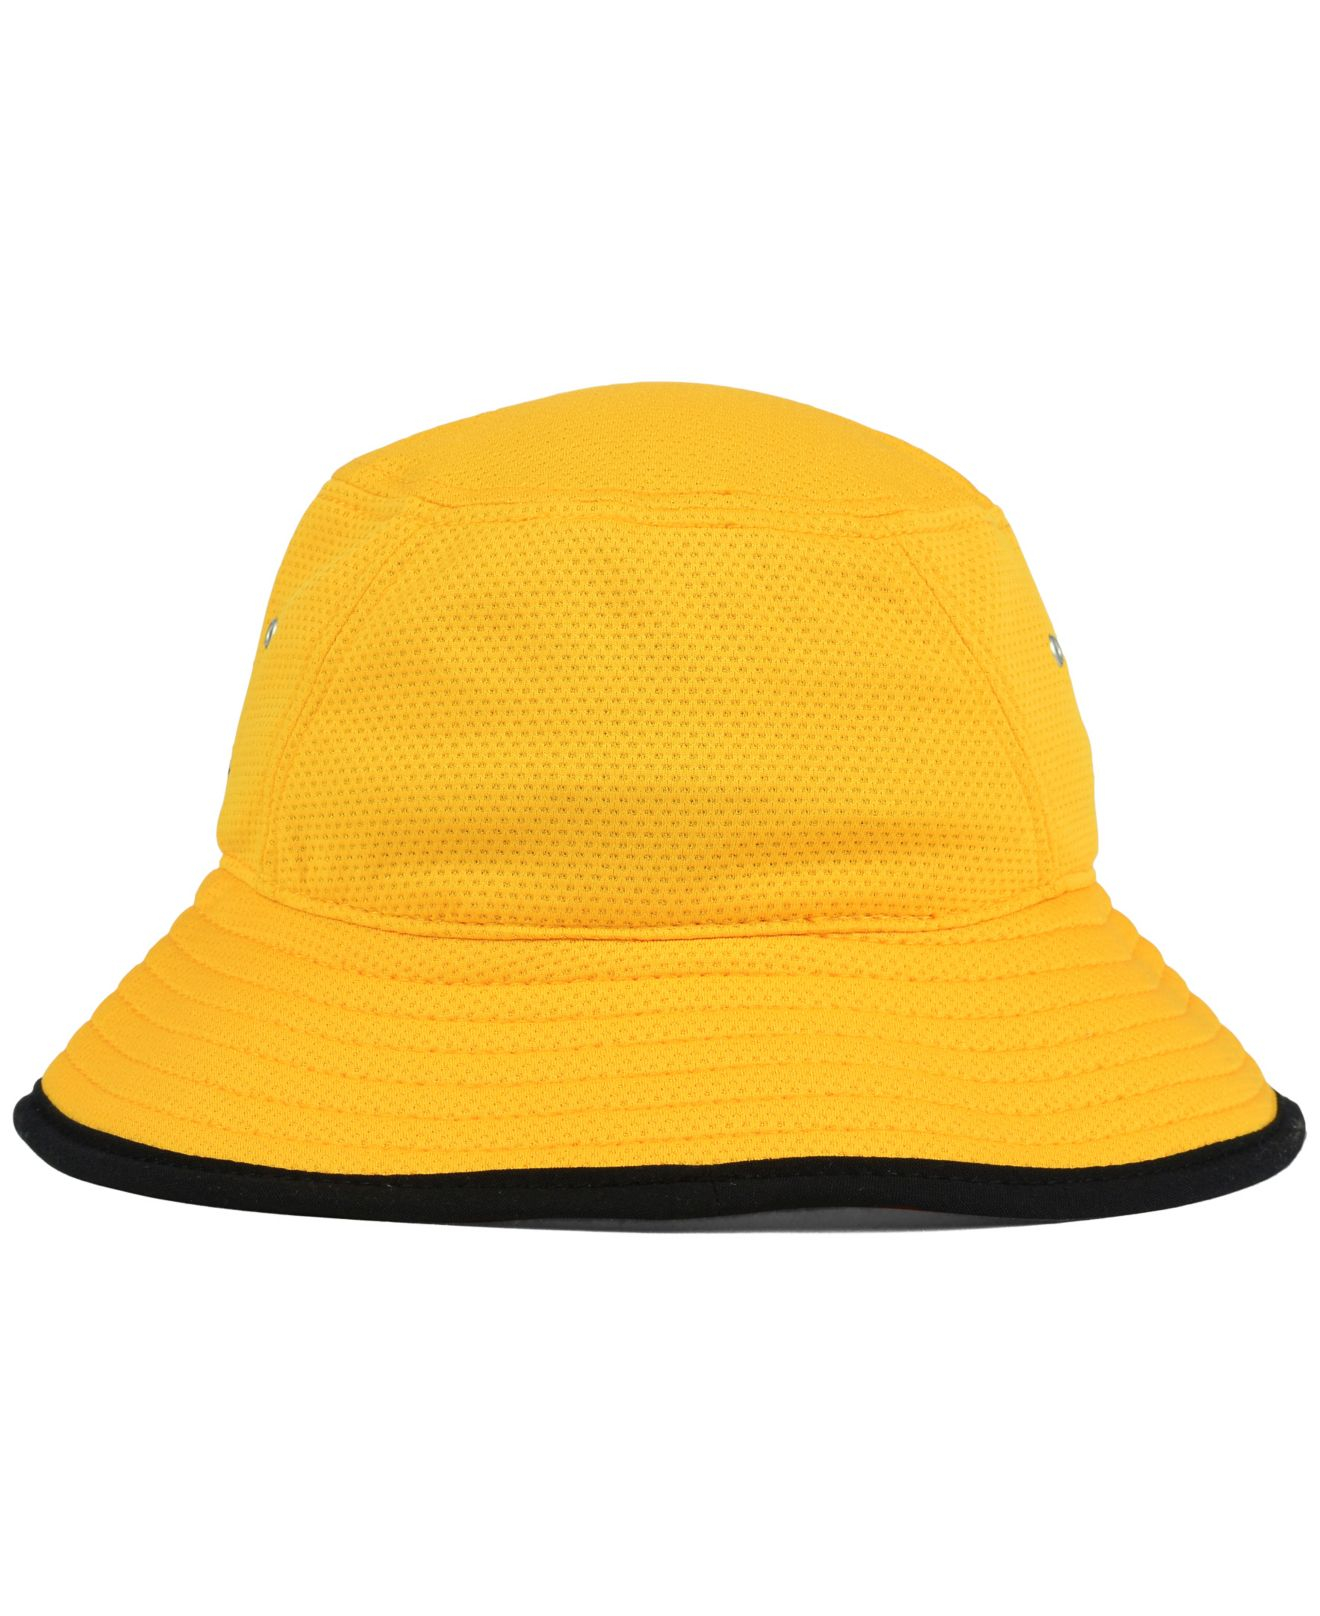 85316fb8014 Lyst - KTZ Pittsburgh Steelers Training Bucket Hat in Yellow for Men